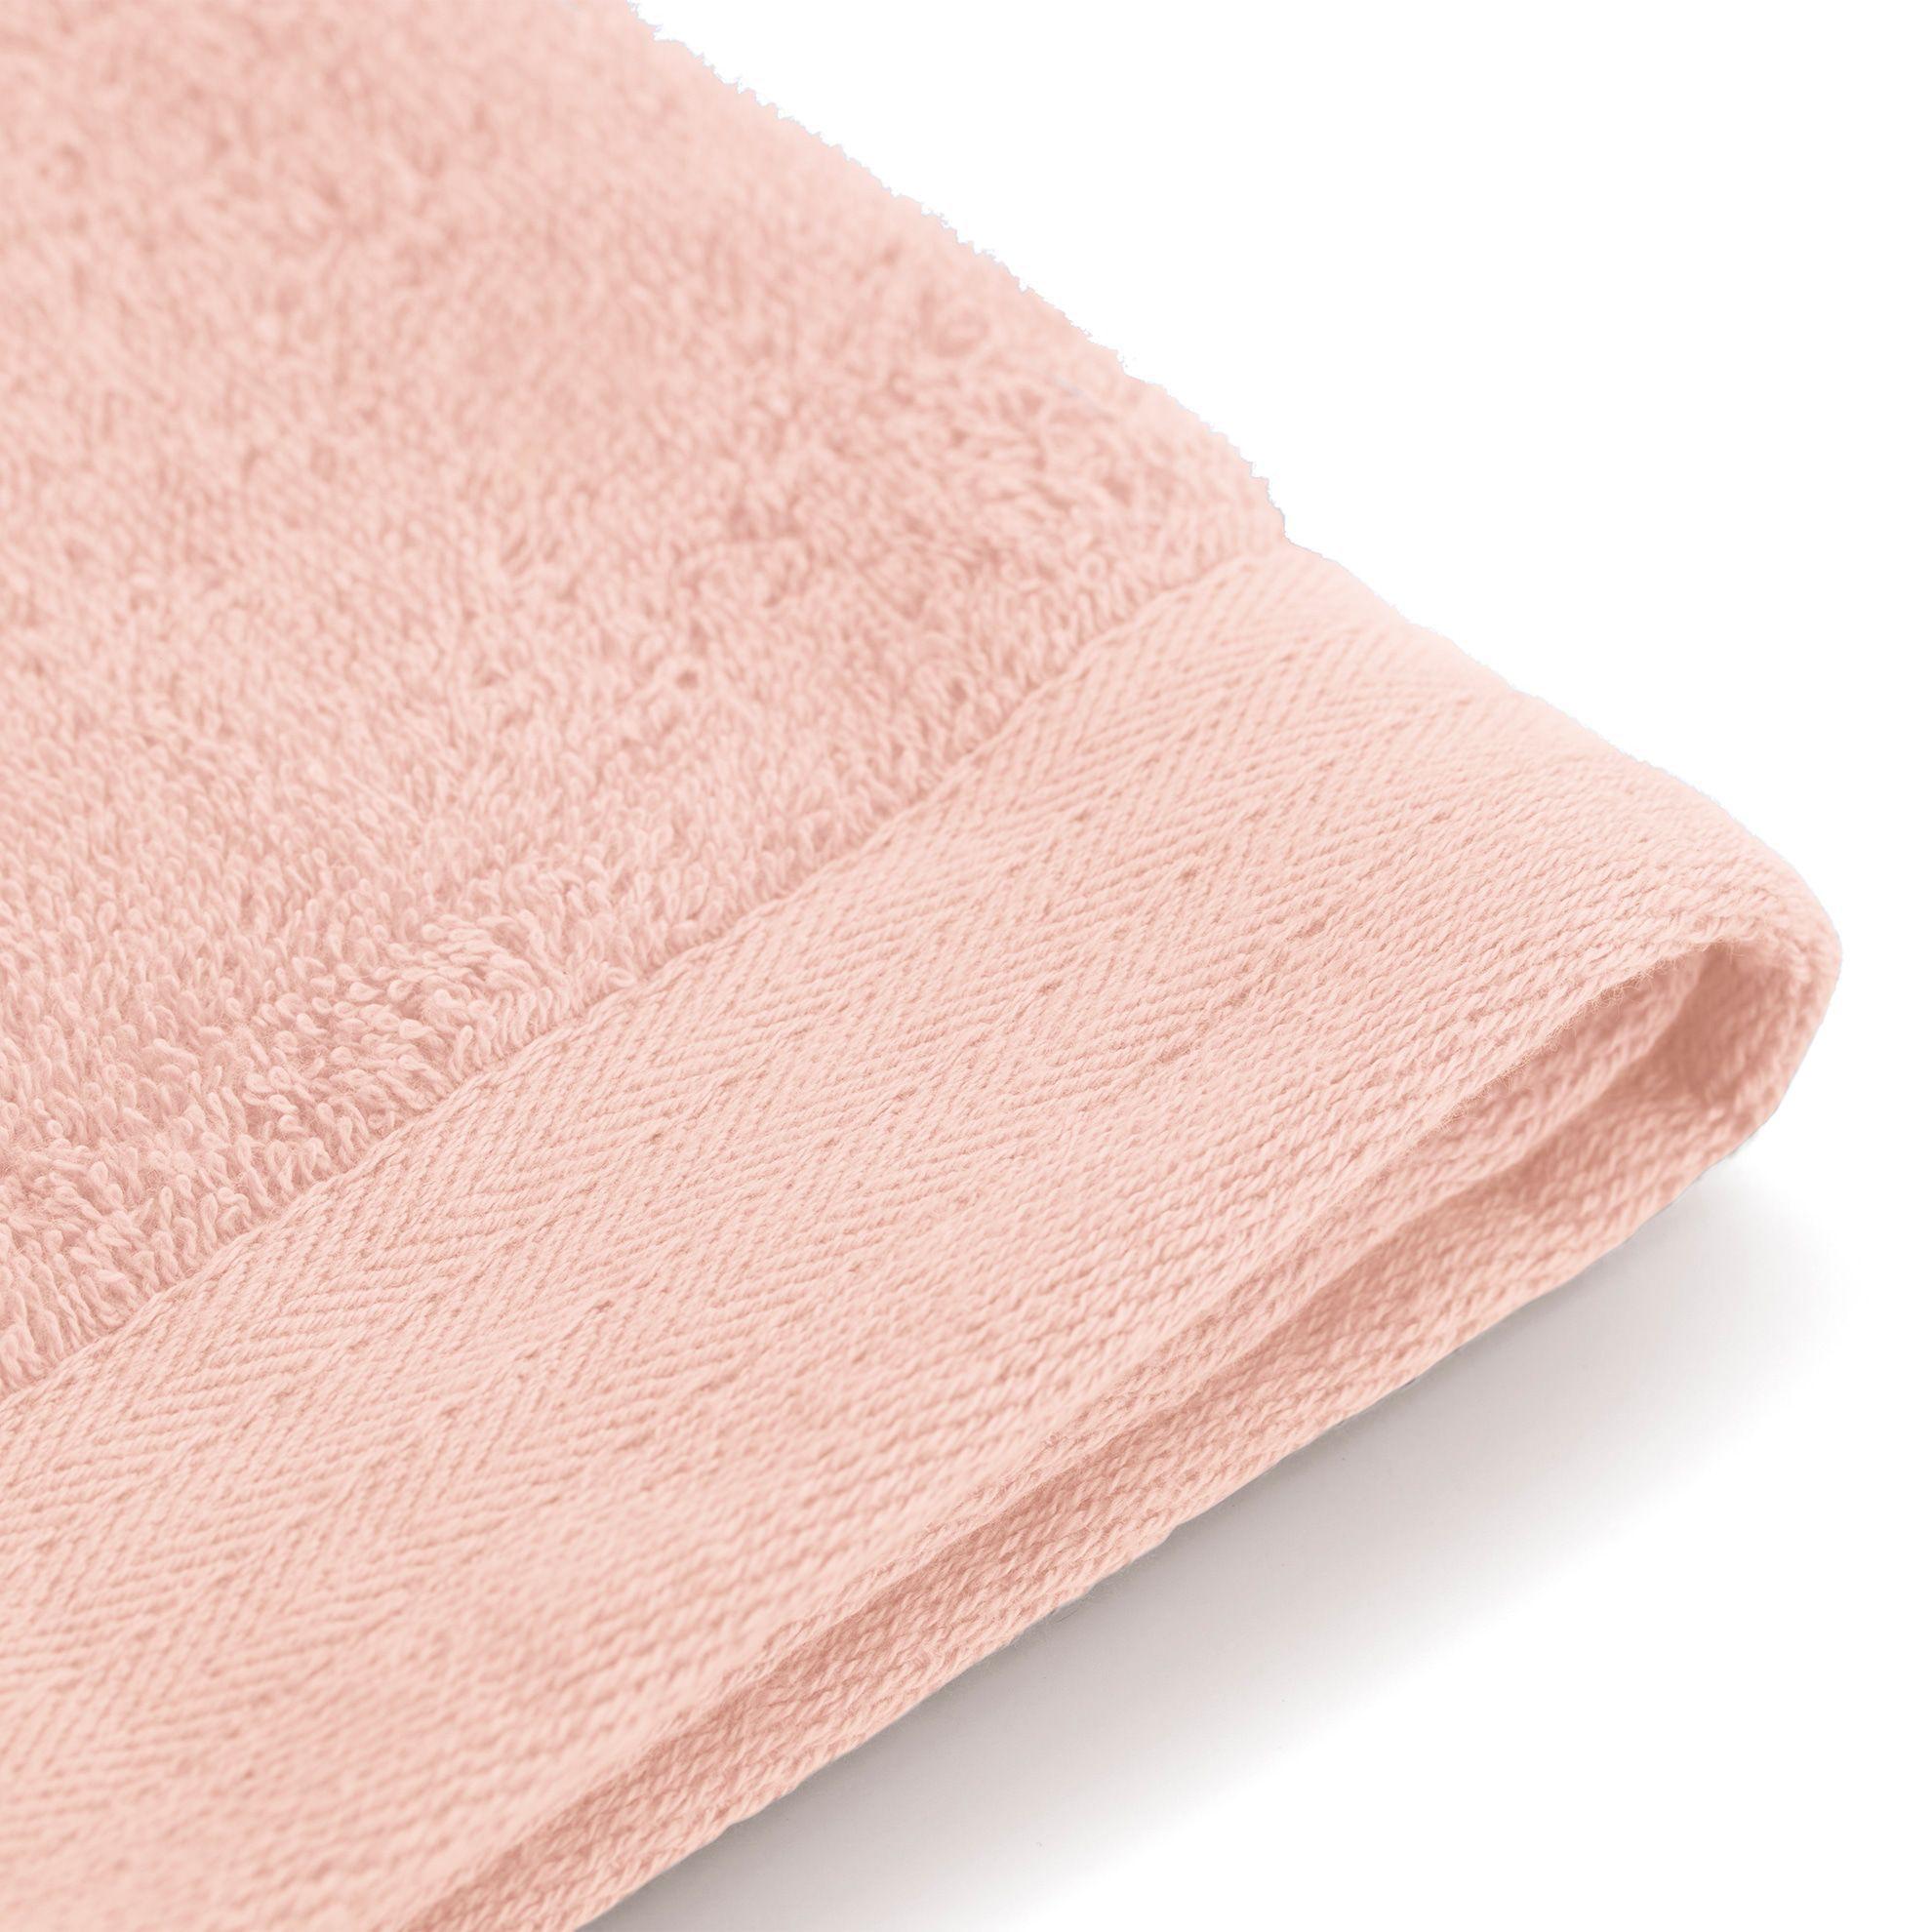 Walra Soft Cotton Gastendoek 30 x 50 cm 550 gram Roze - 2 stuks